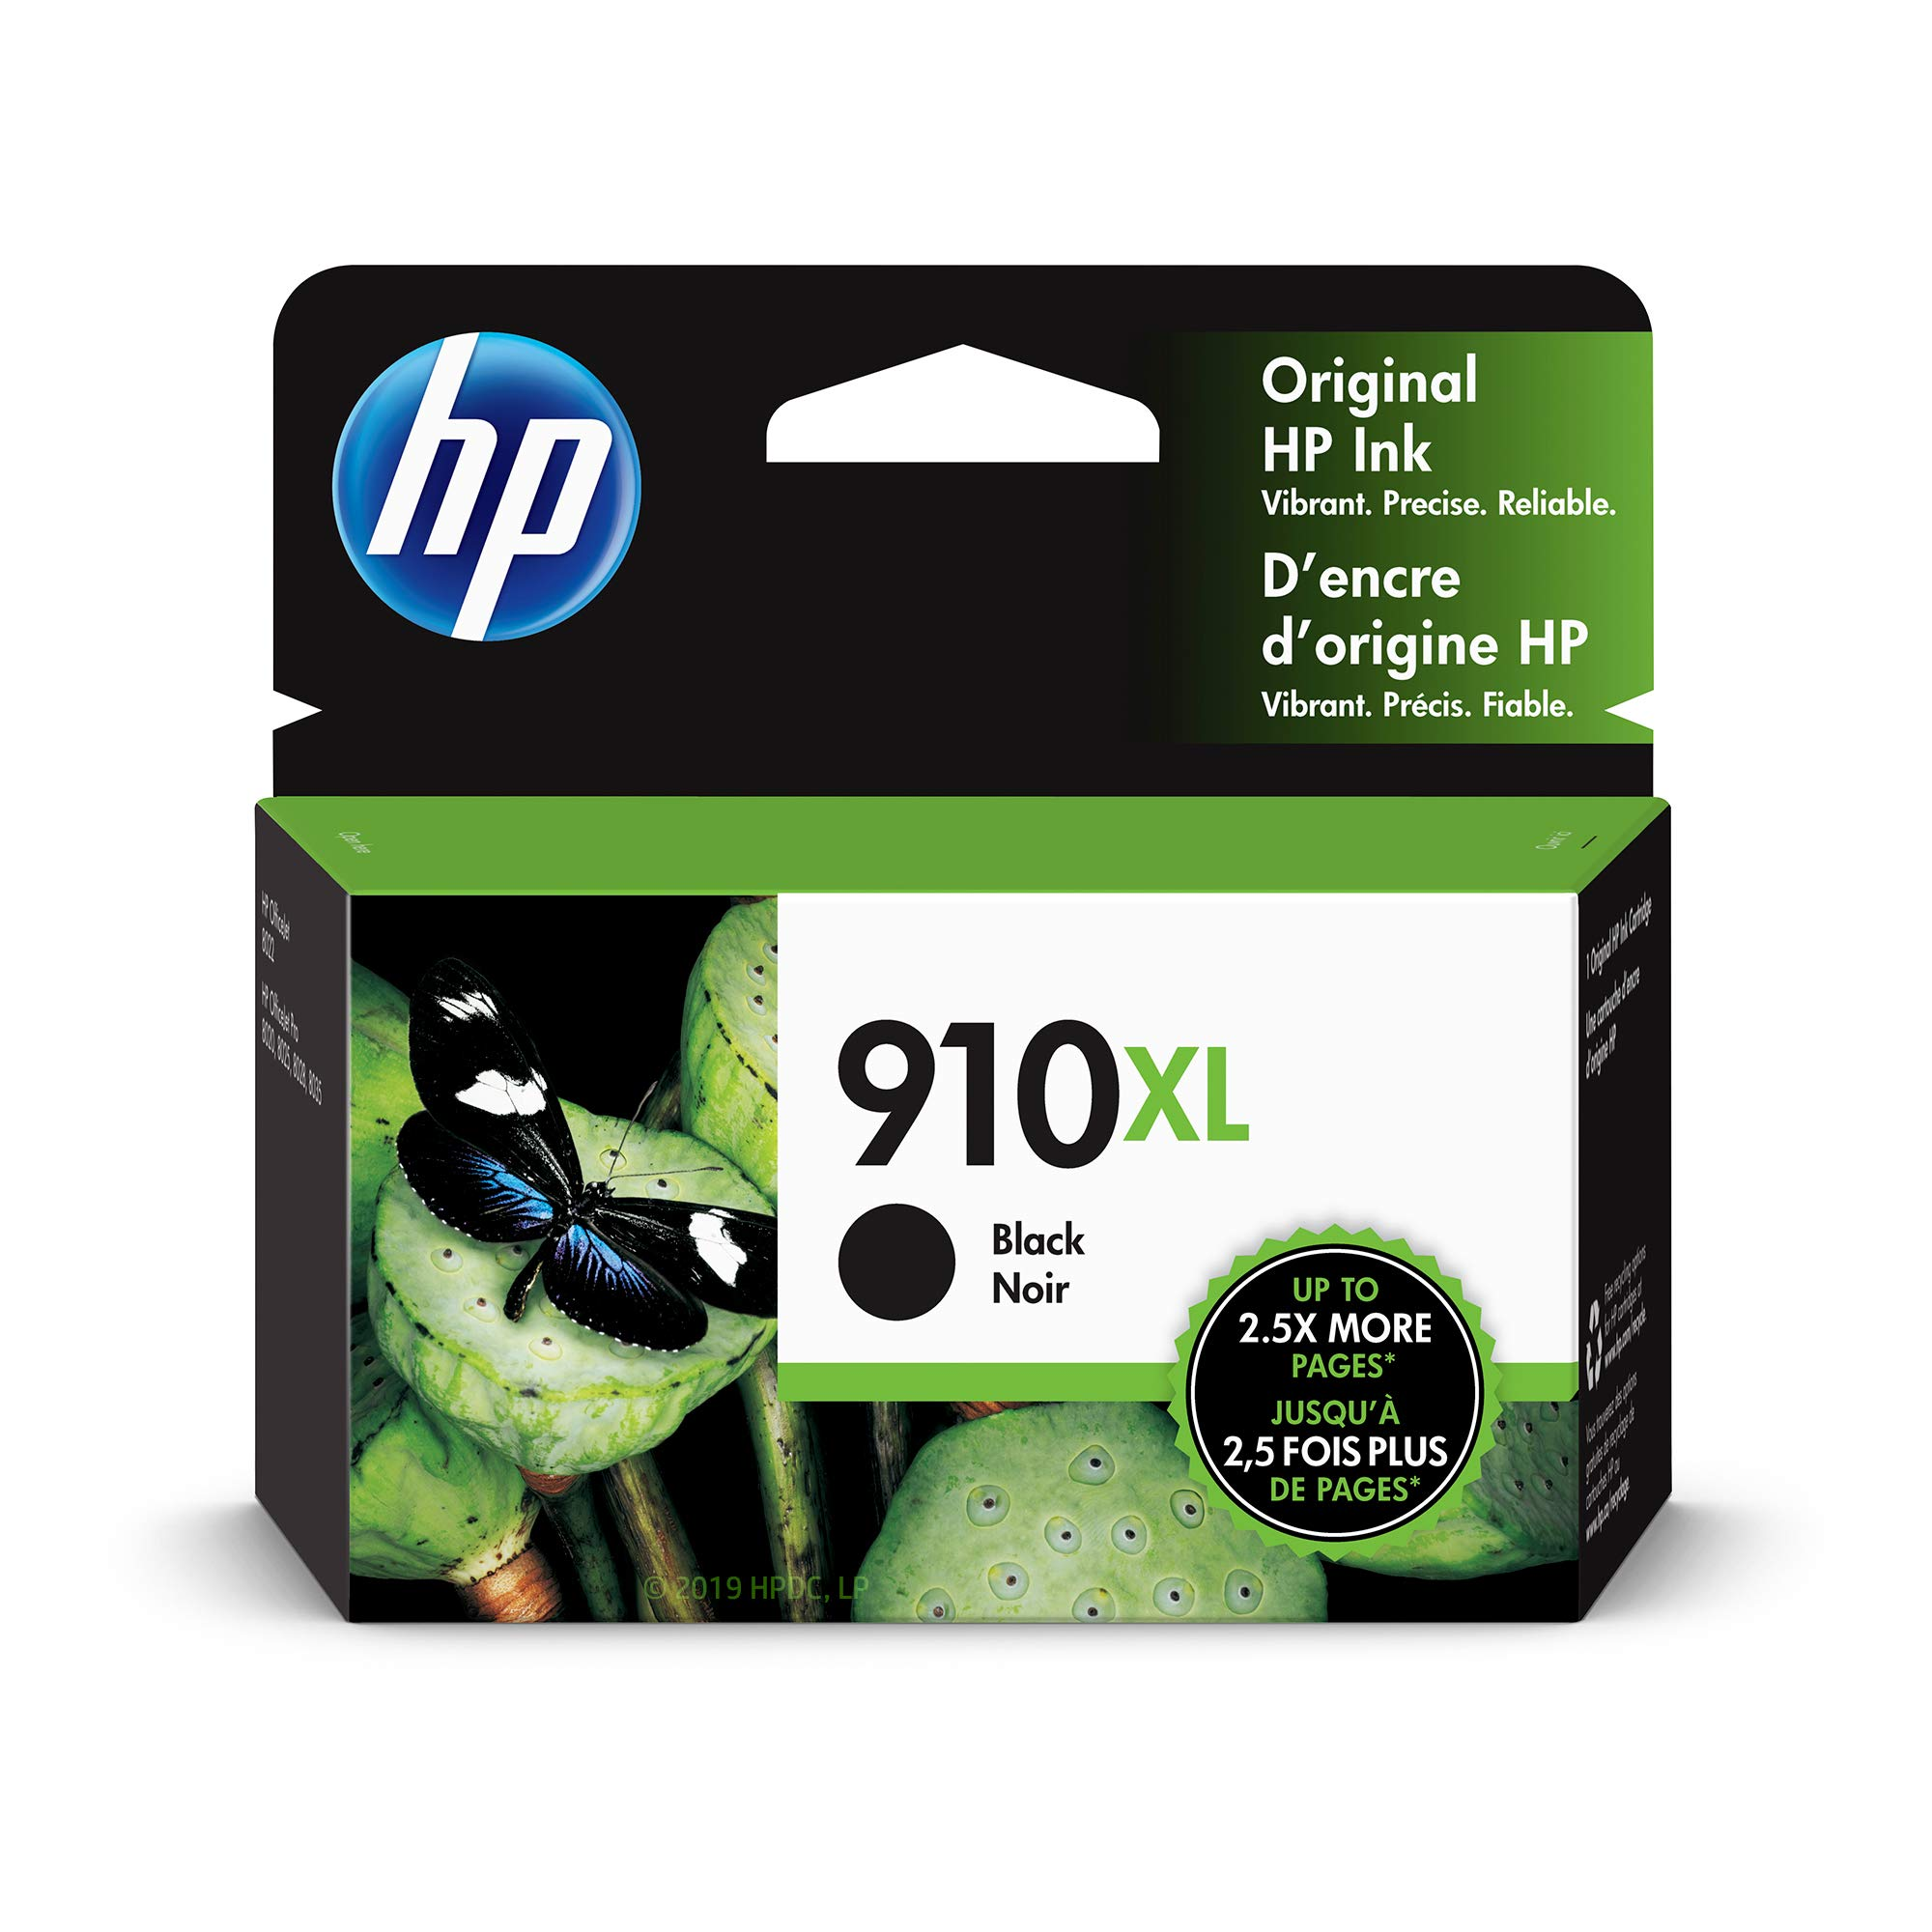 HP 910XL Black Original Ink Cartridge (3YL65AN)